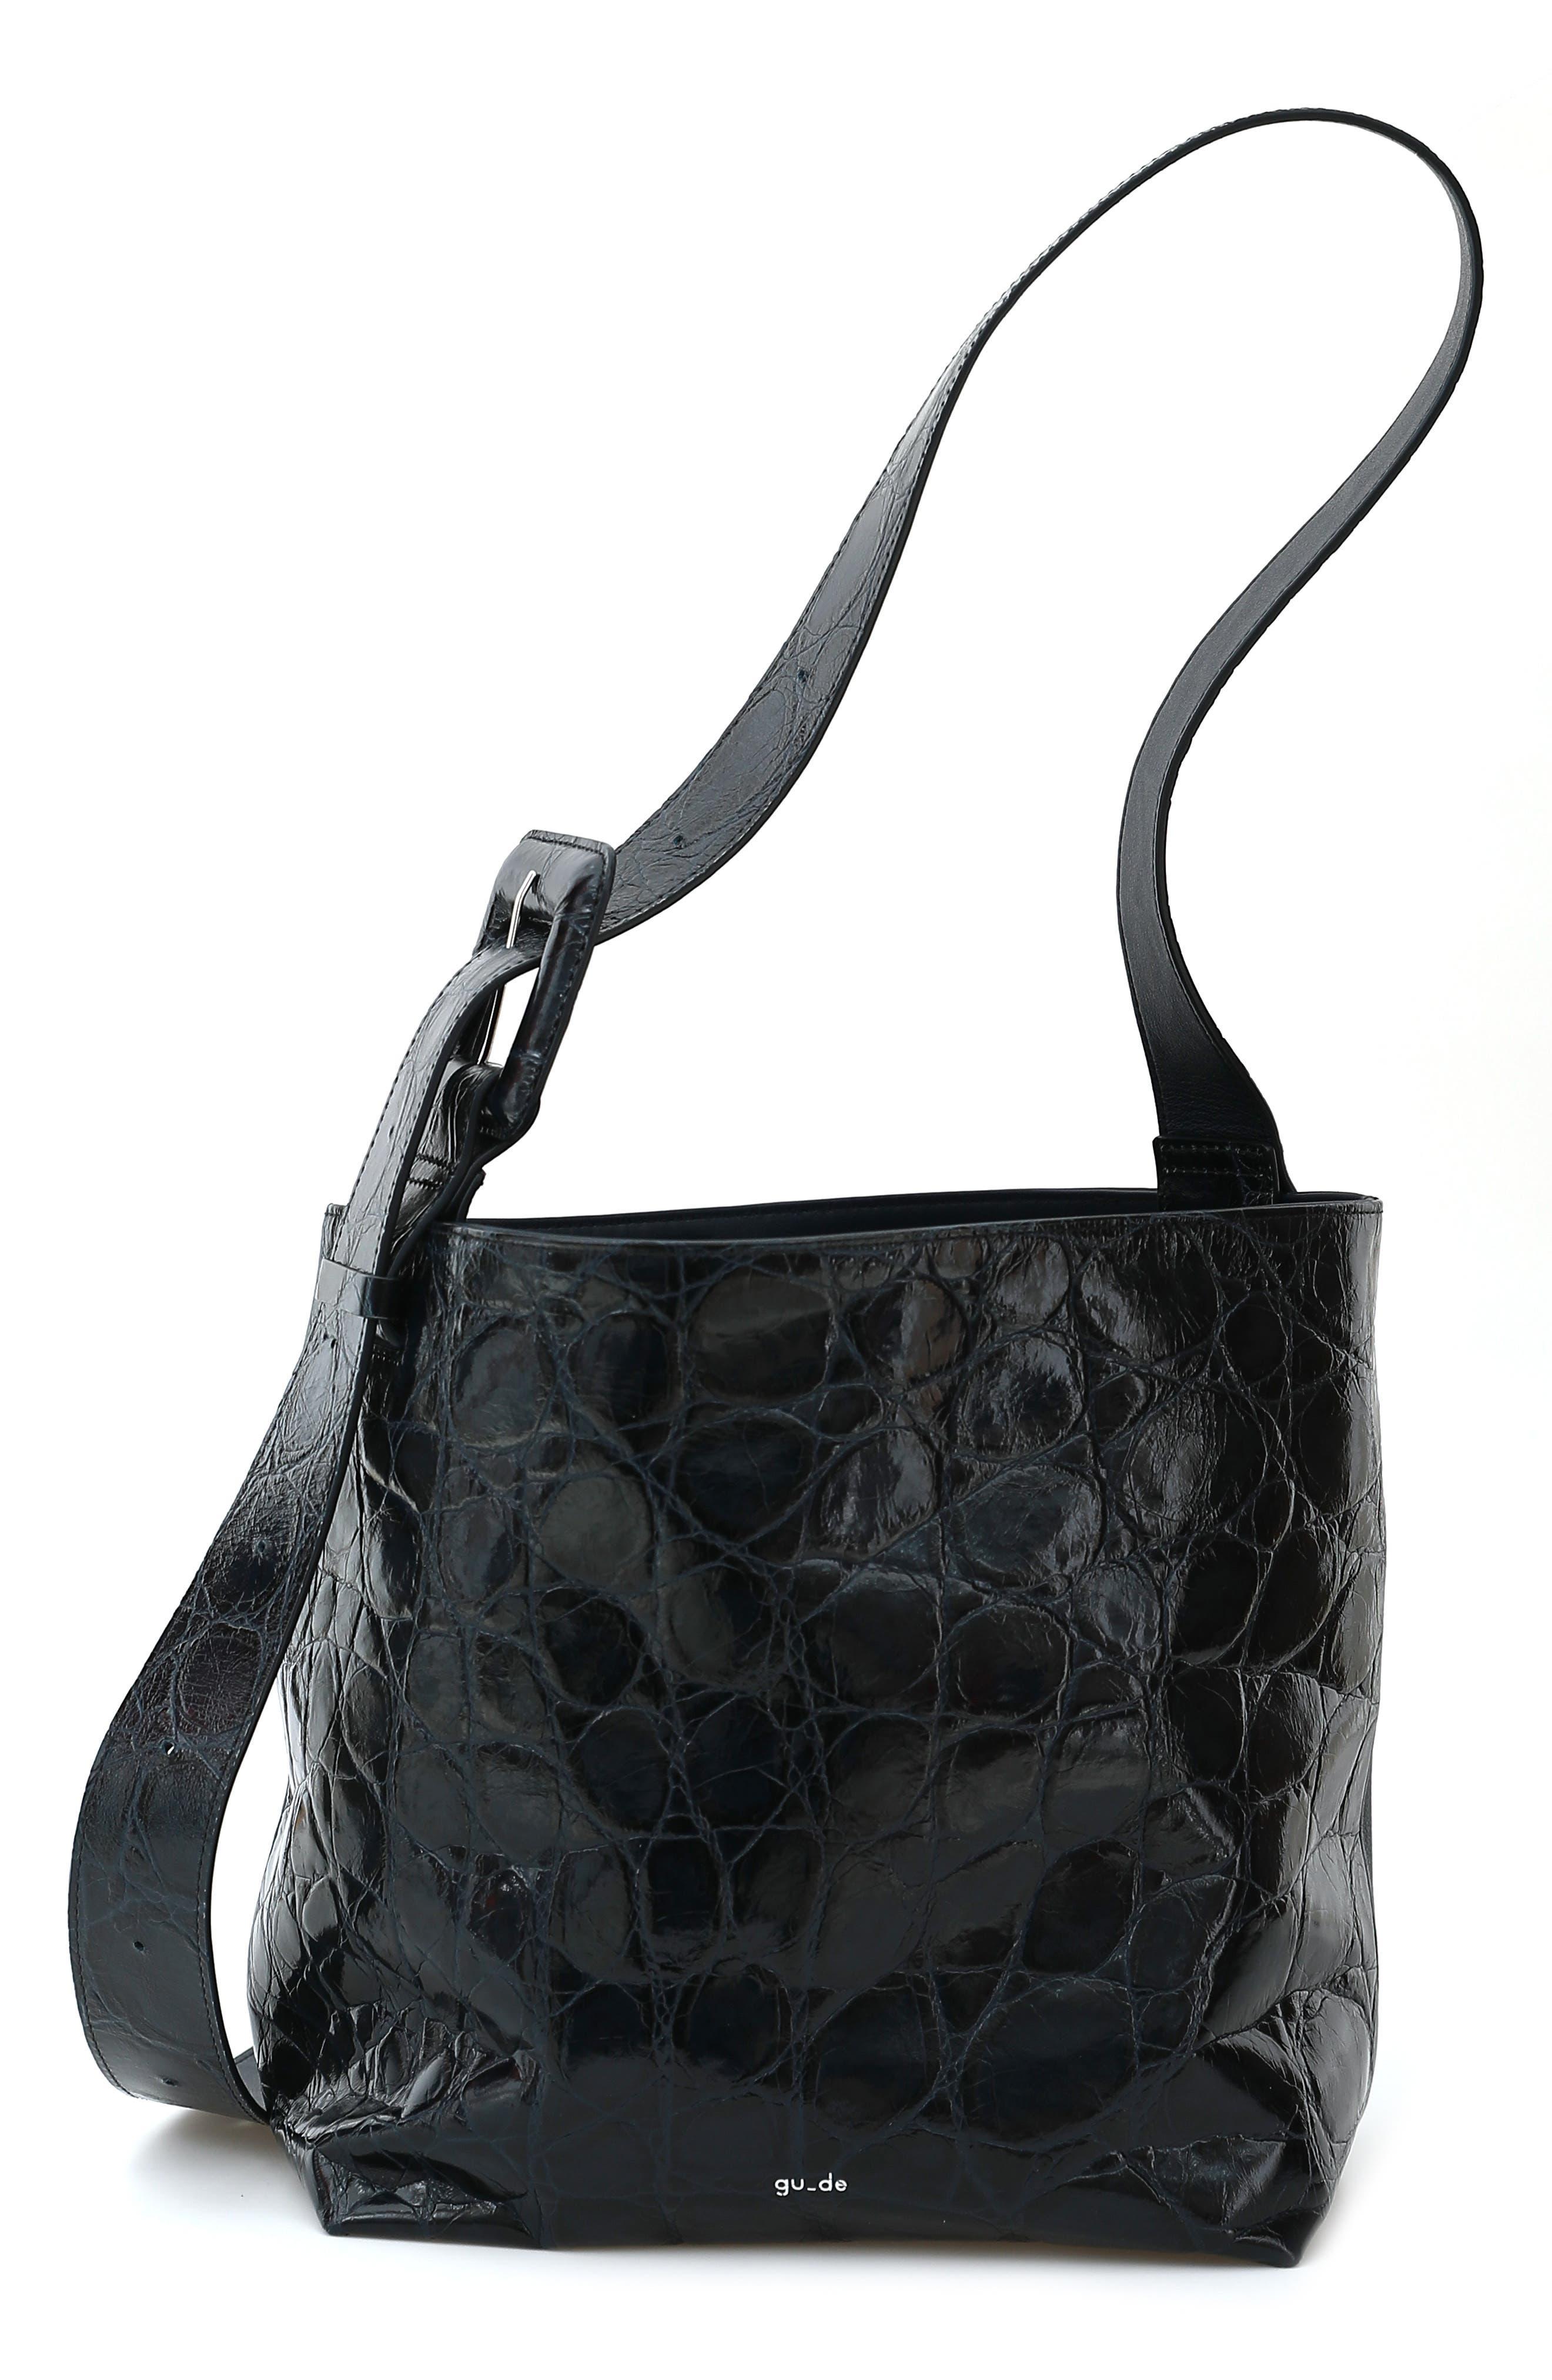 Gu-De Small Kate Leather Shoulder Bag